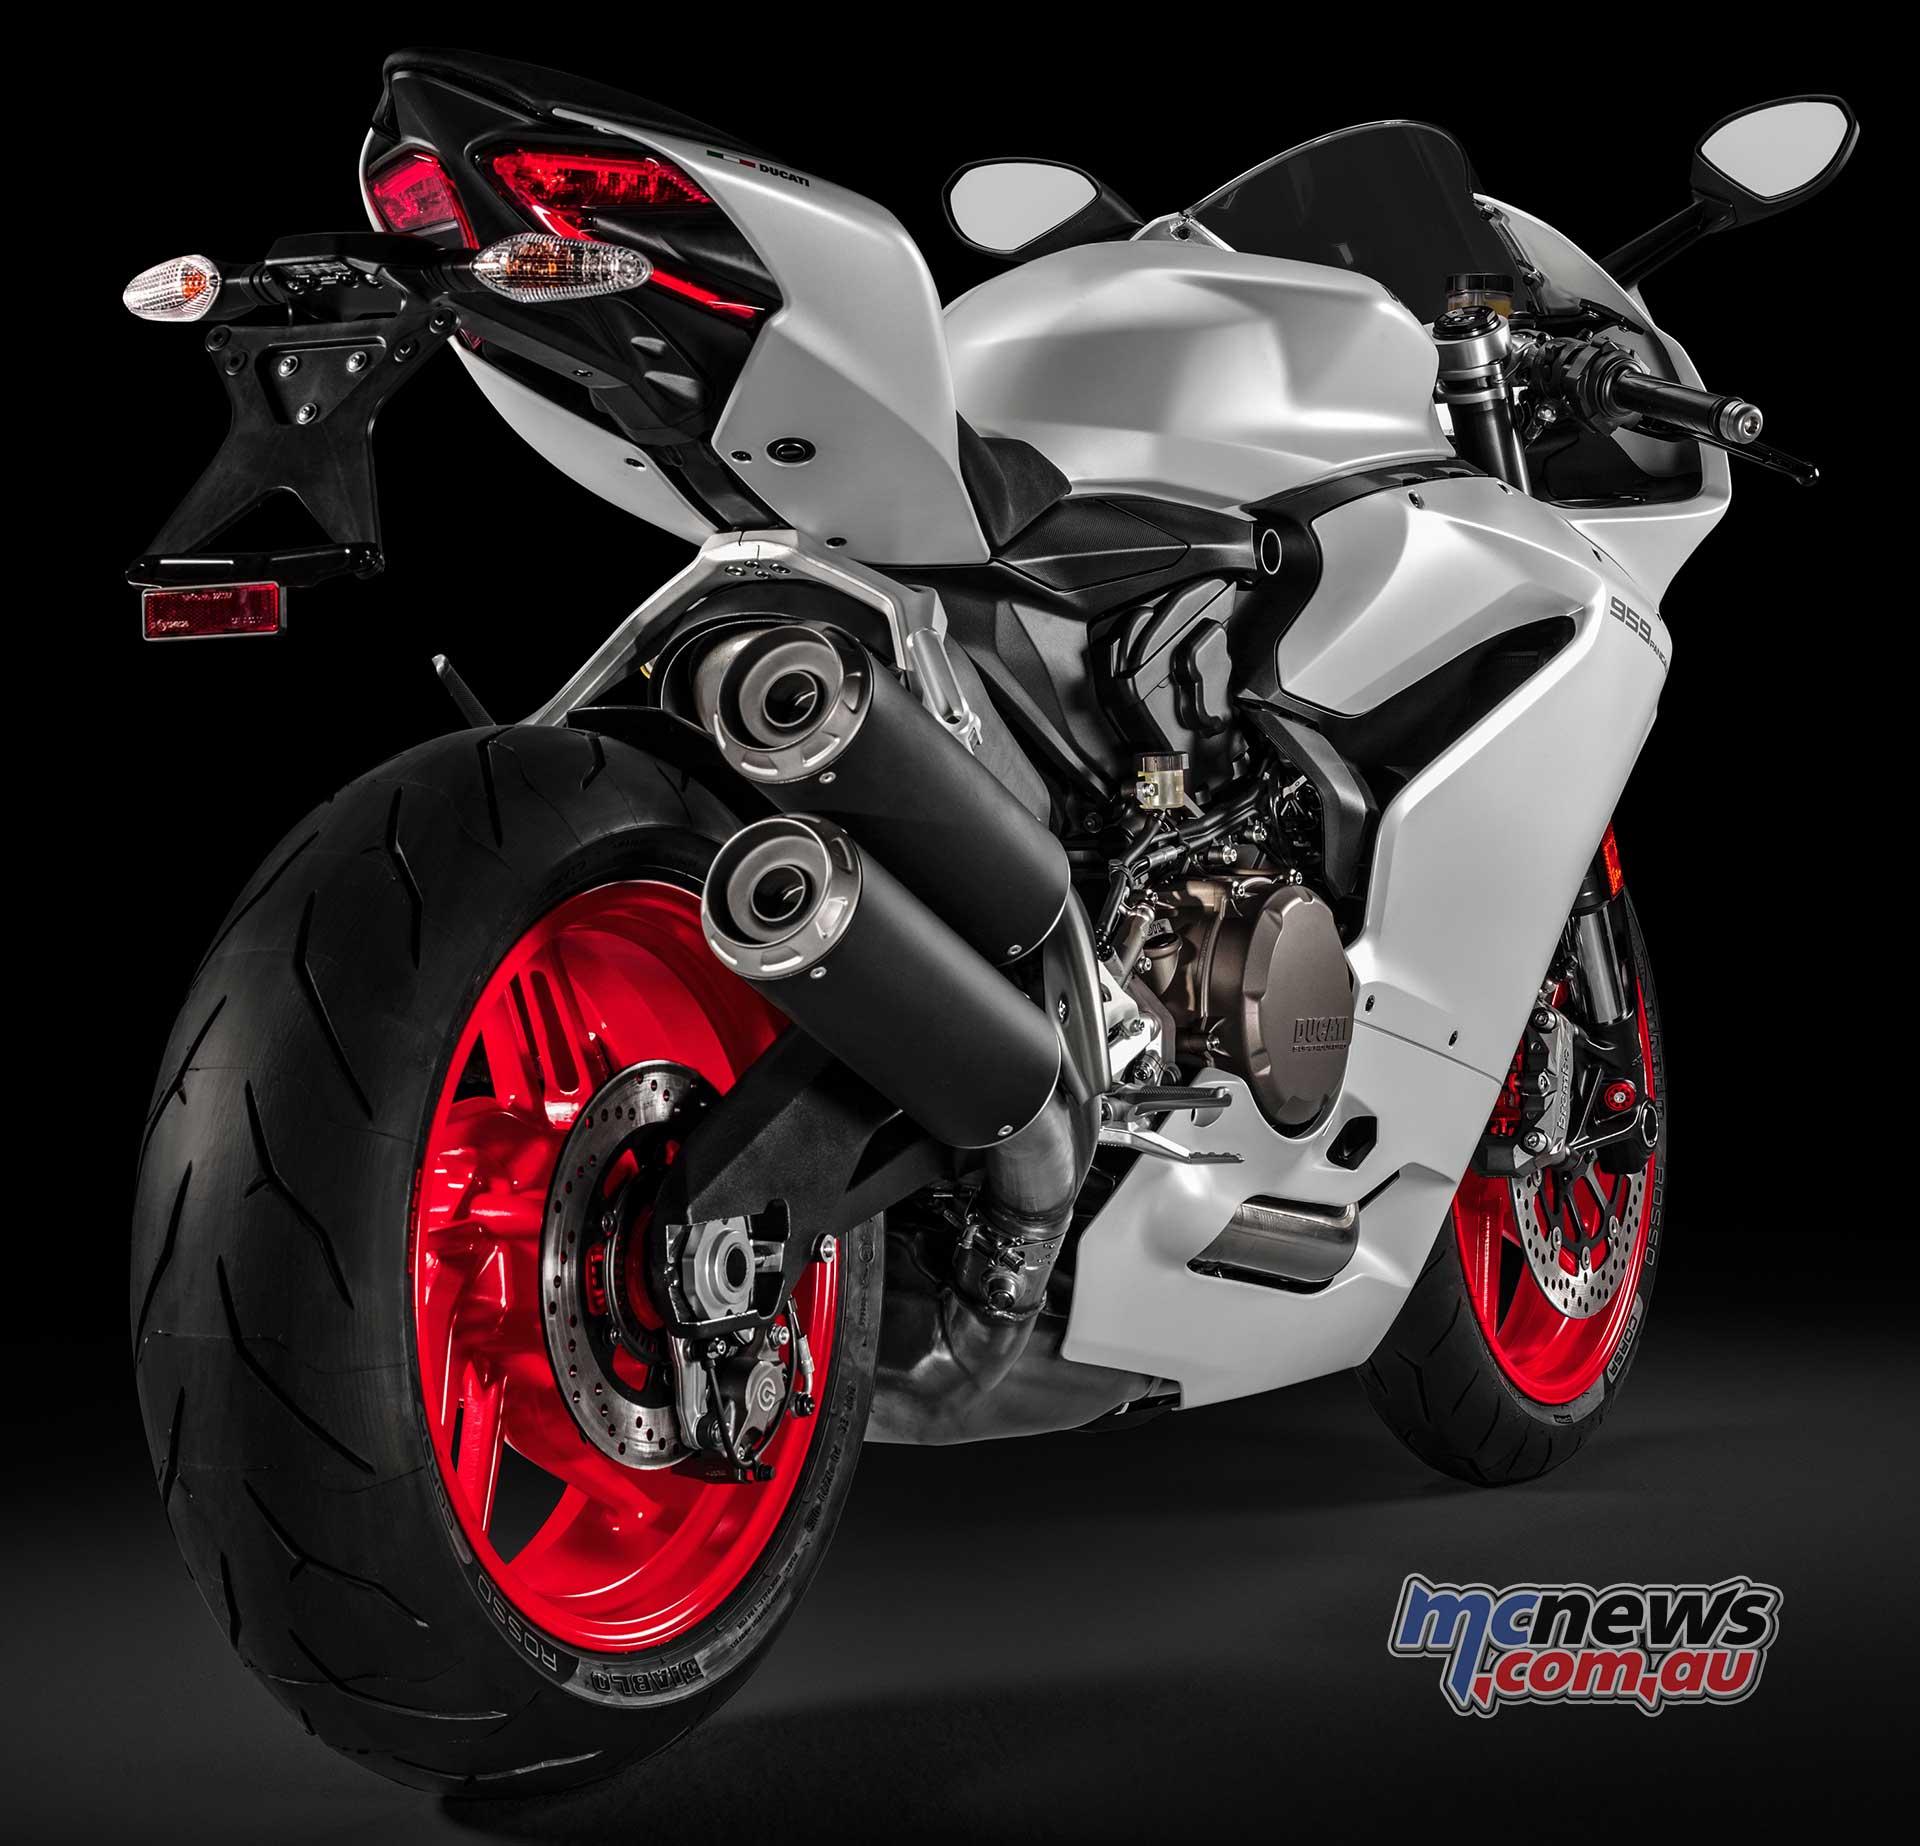 Ducati Bike Front View